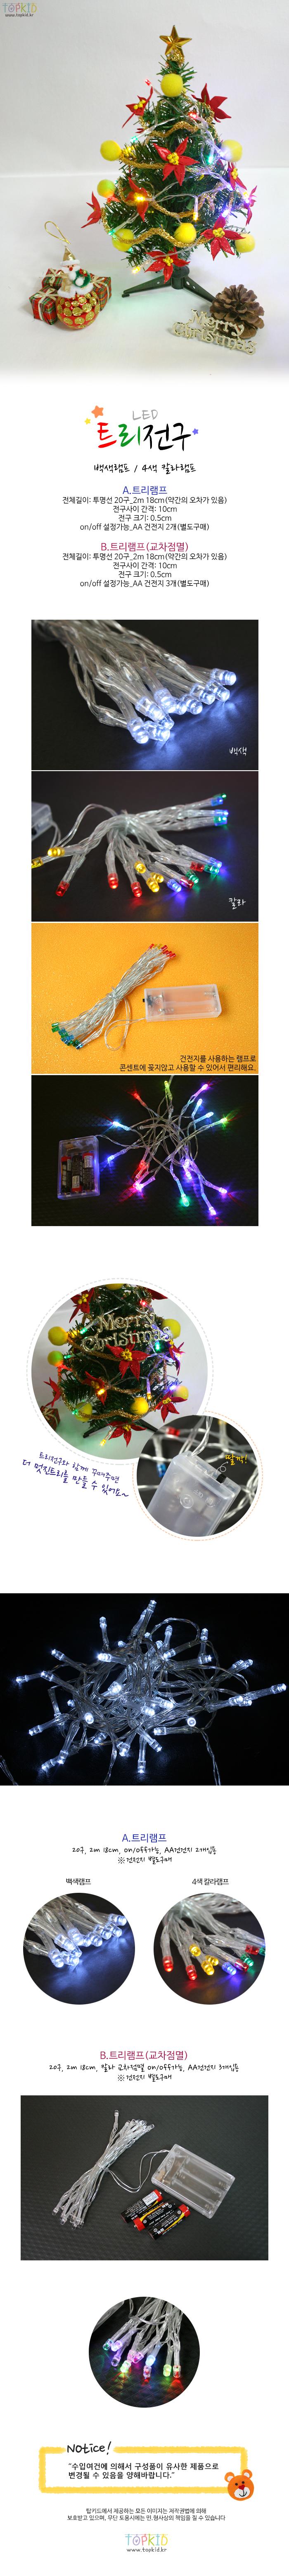 LED 전구(건전지용) 백색or 칼라 - 하비파티, 2,500원, 조명, 크리스마스조명